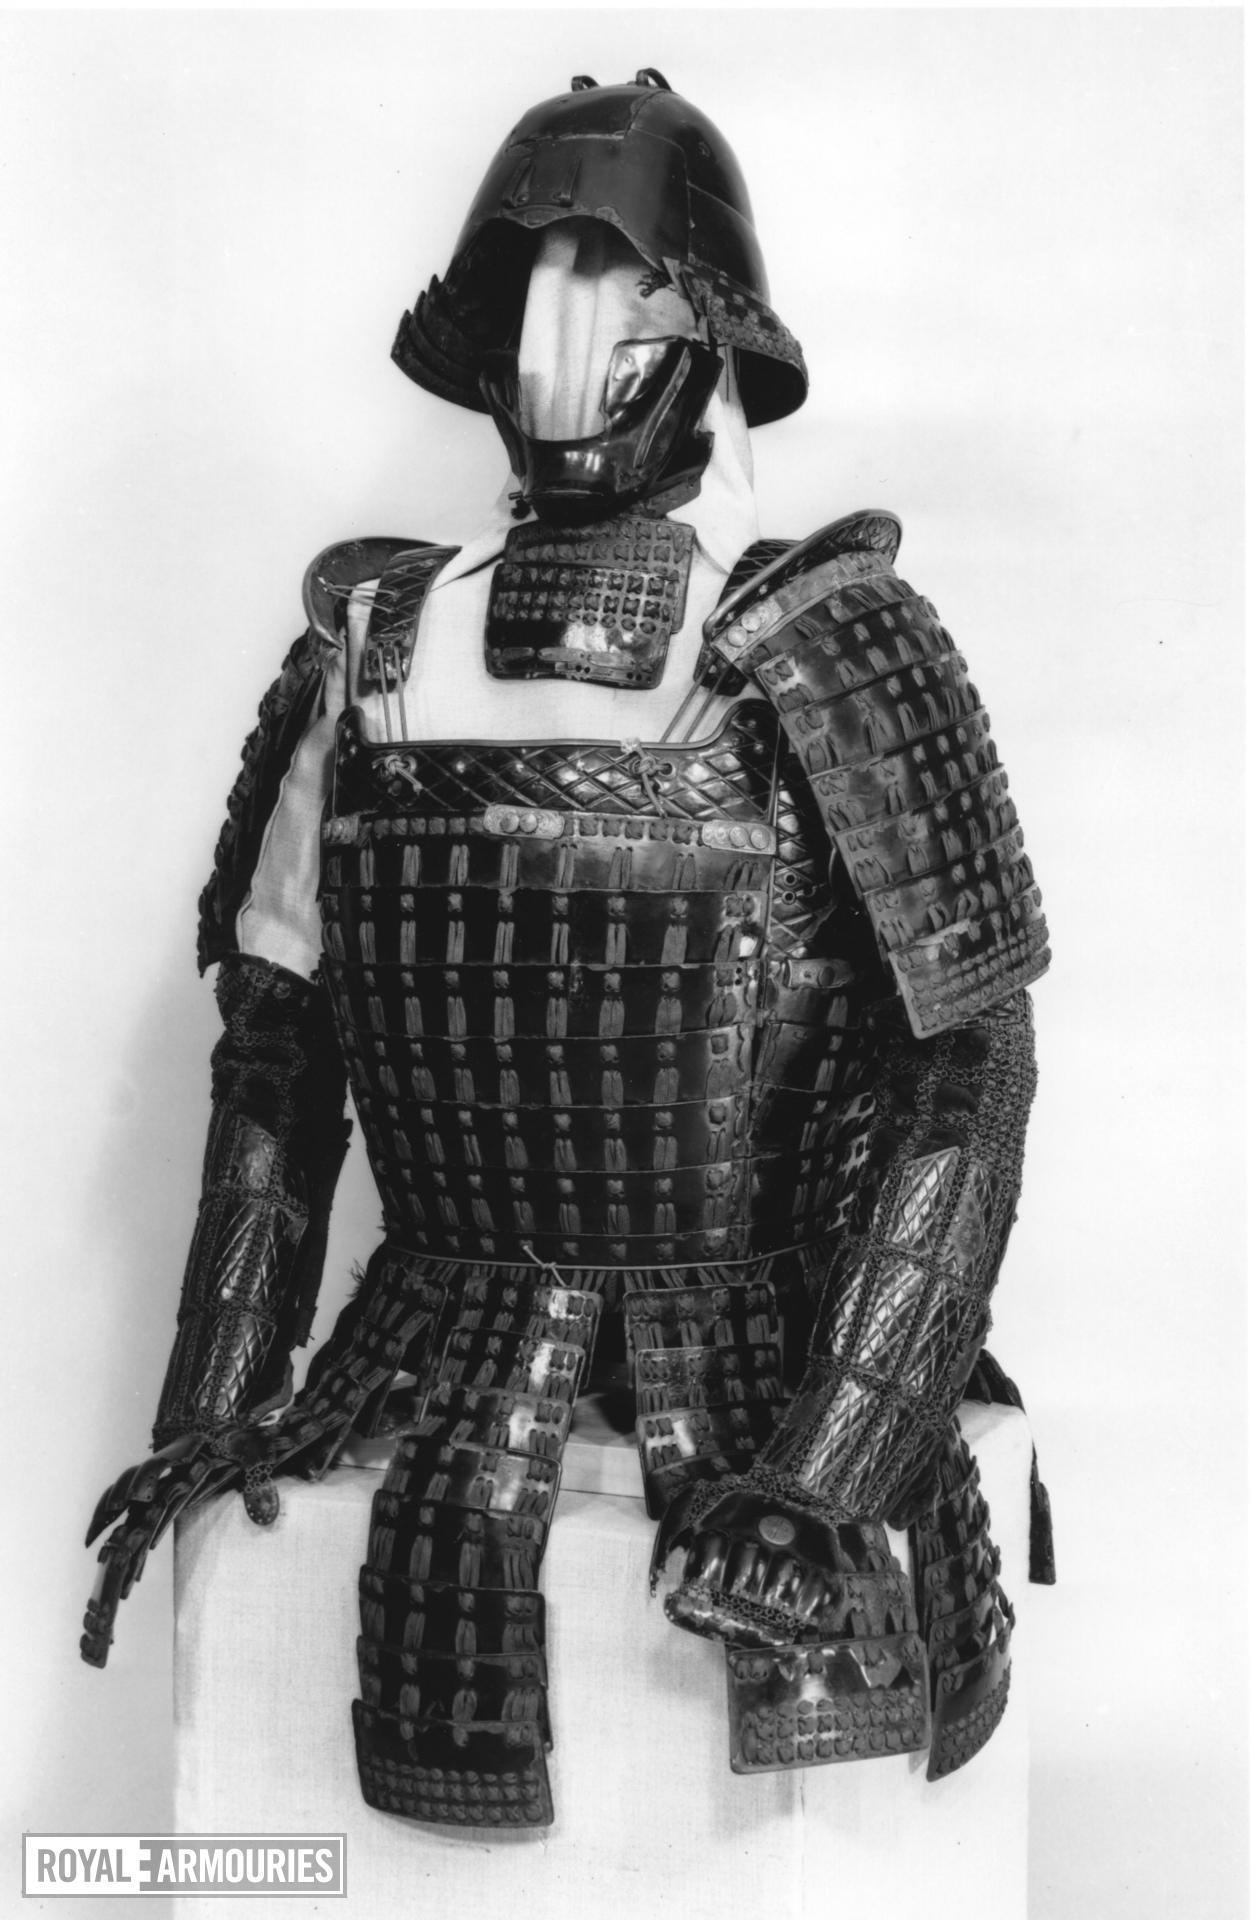 Armour (mogami haramaki gusoku) of a member of the Shimazu family